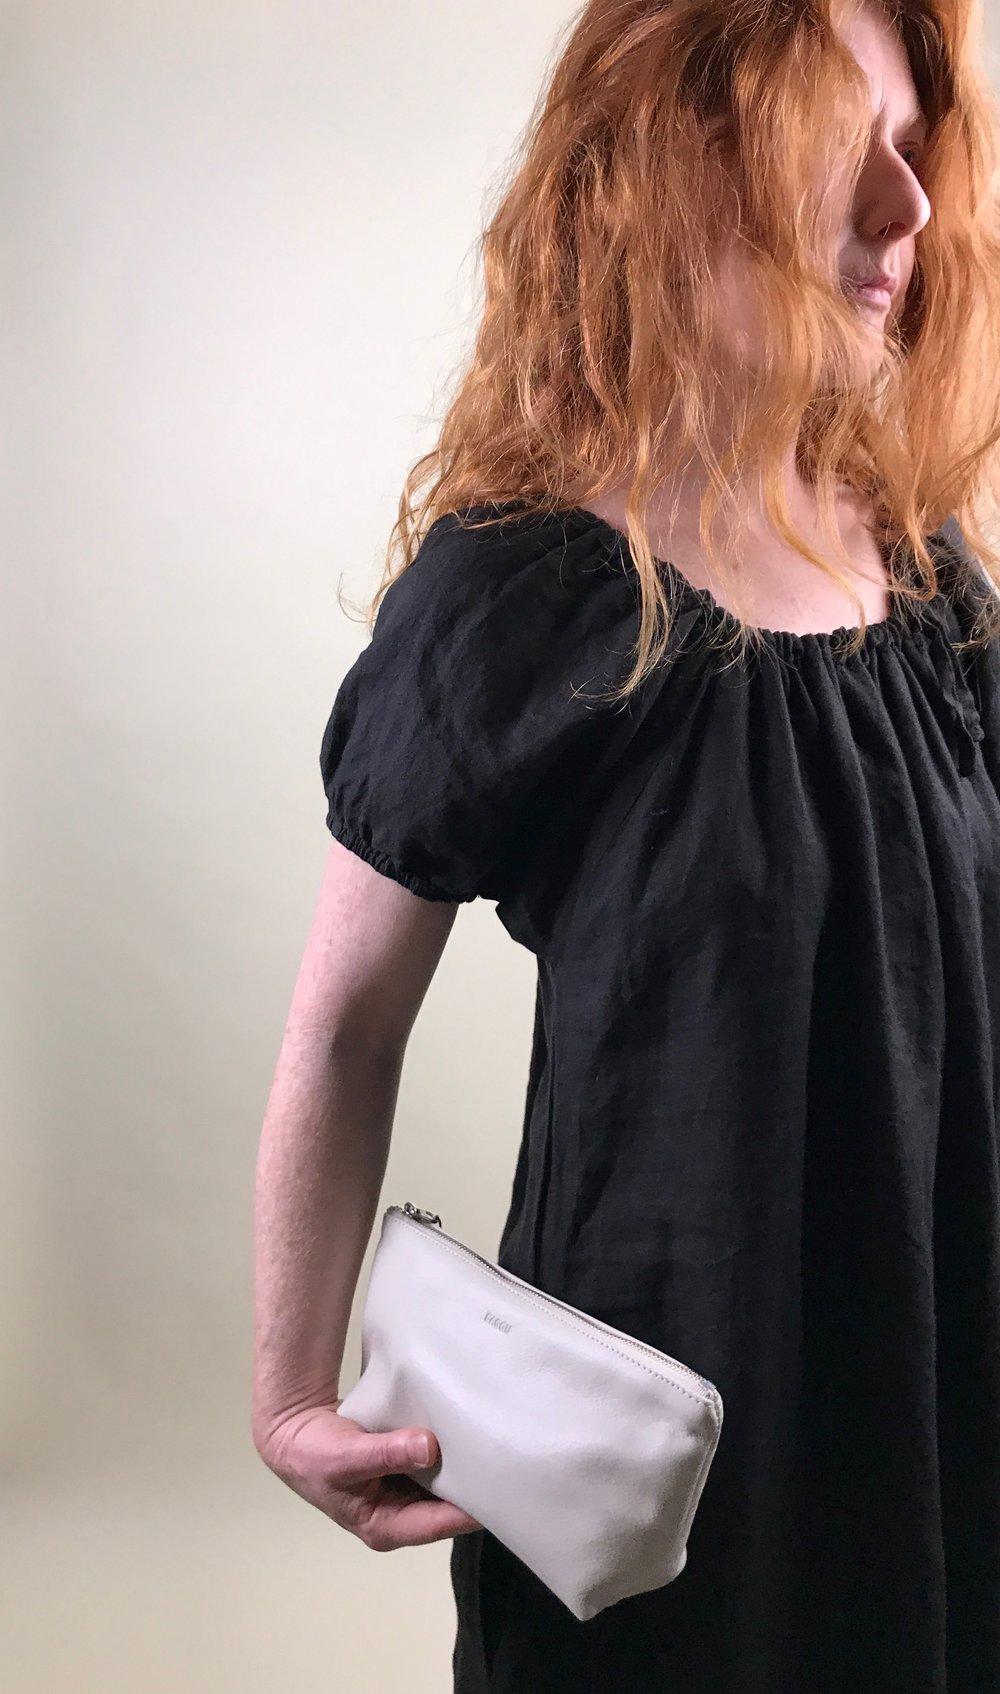 trumpet dress + baggu pouch